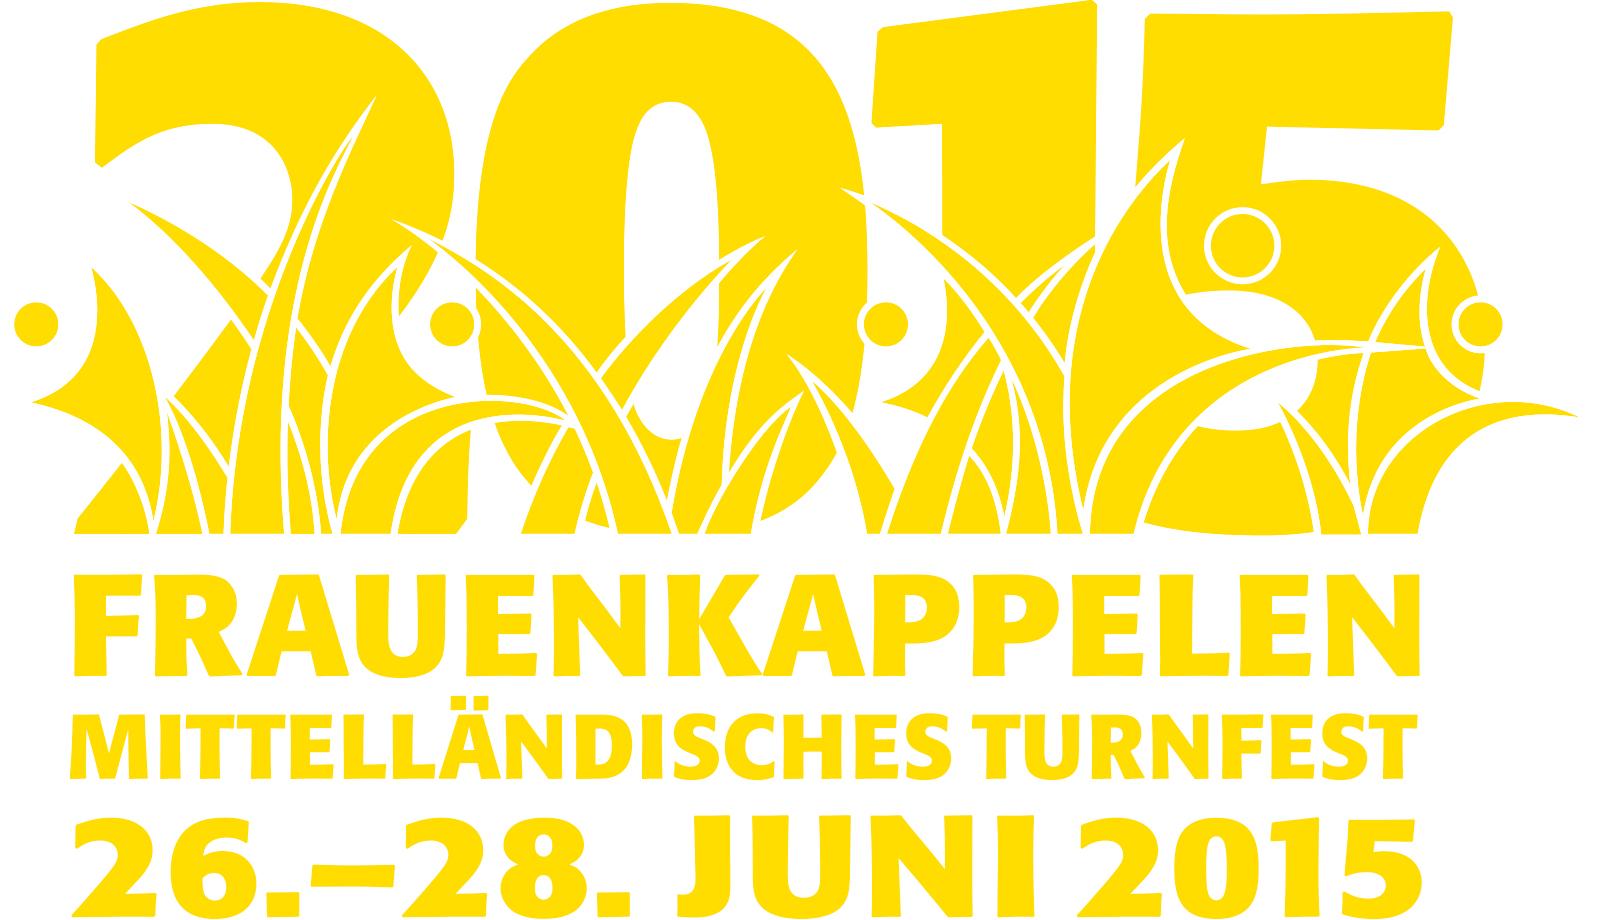 Logo_Frauenkappelen2015_RGB_Gelb